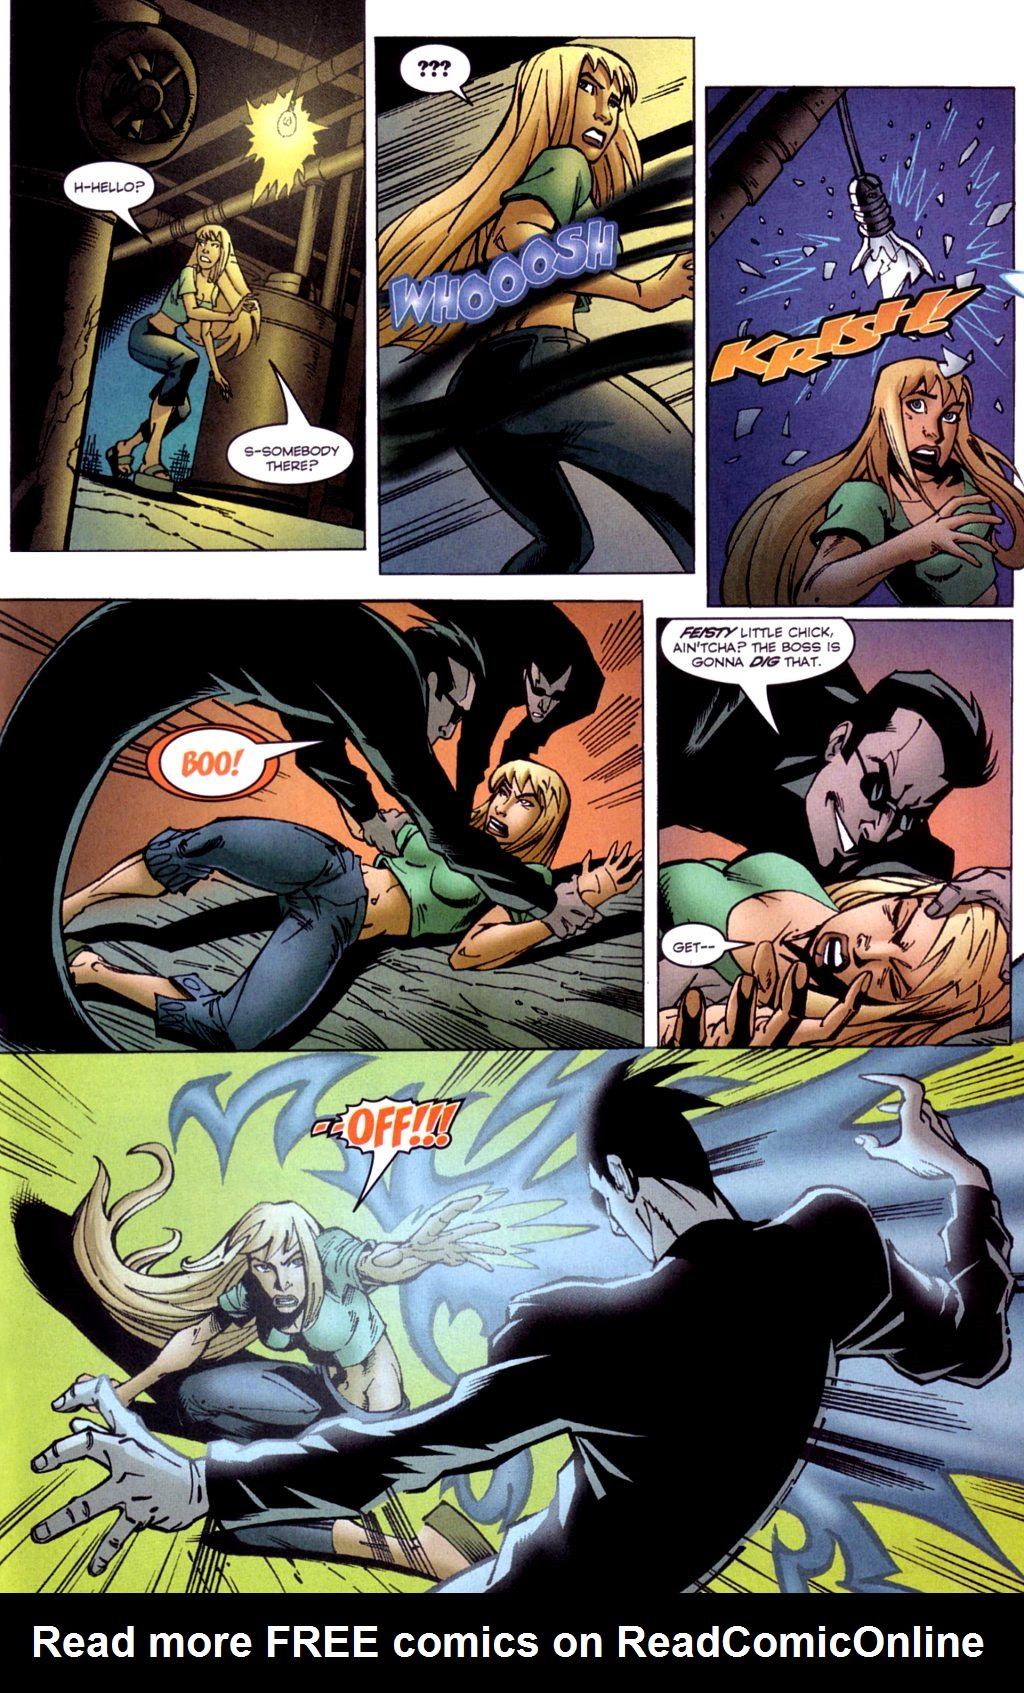 Read online Jezebelle comic -  Issue #2 - 18